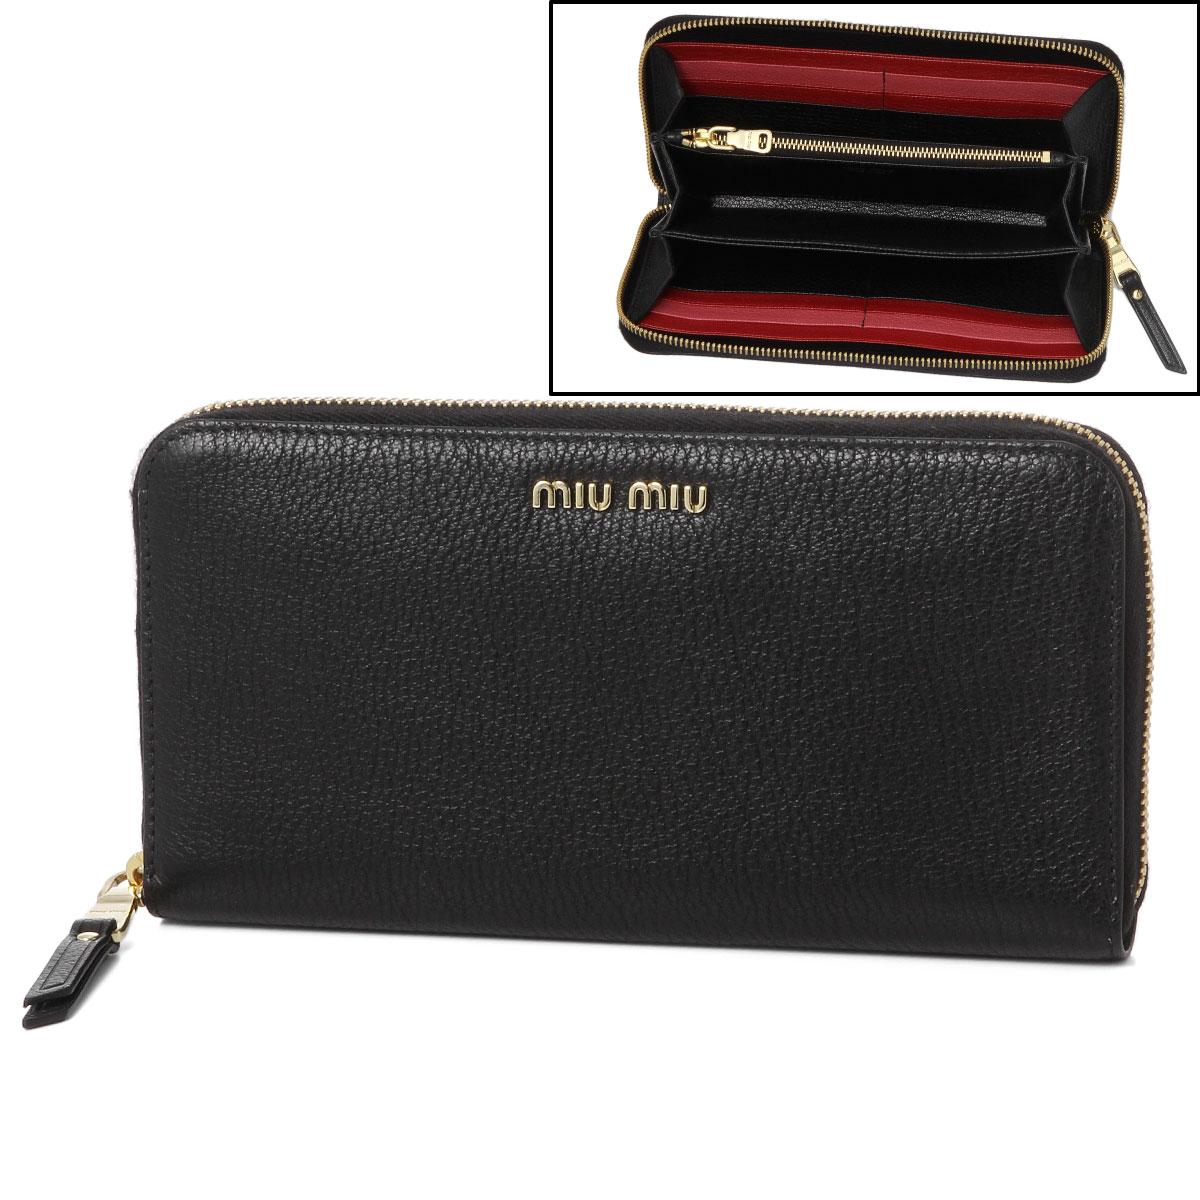 e74ed599c56 ミュウミュウ MIU MIU wallet Lady s 5ML506 2BJI F0LJ4 round fastener long wallet  MADRAS COLOUR B NERO FUOCO black